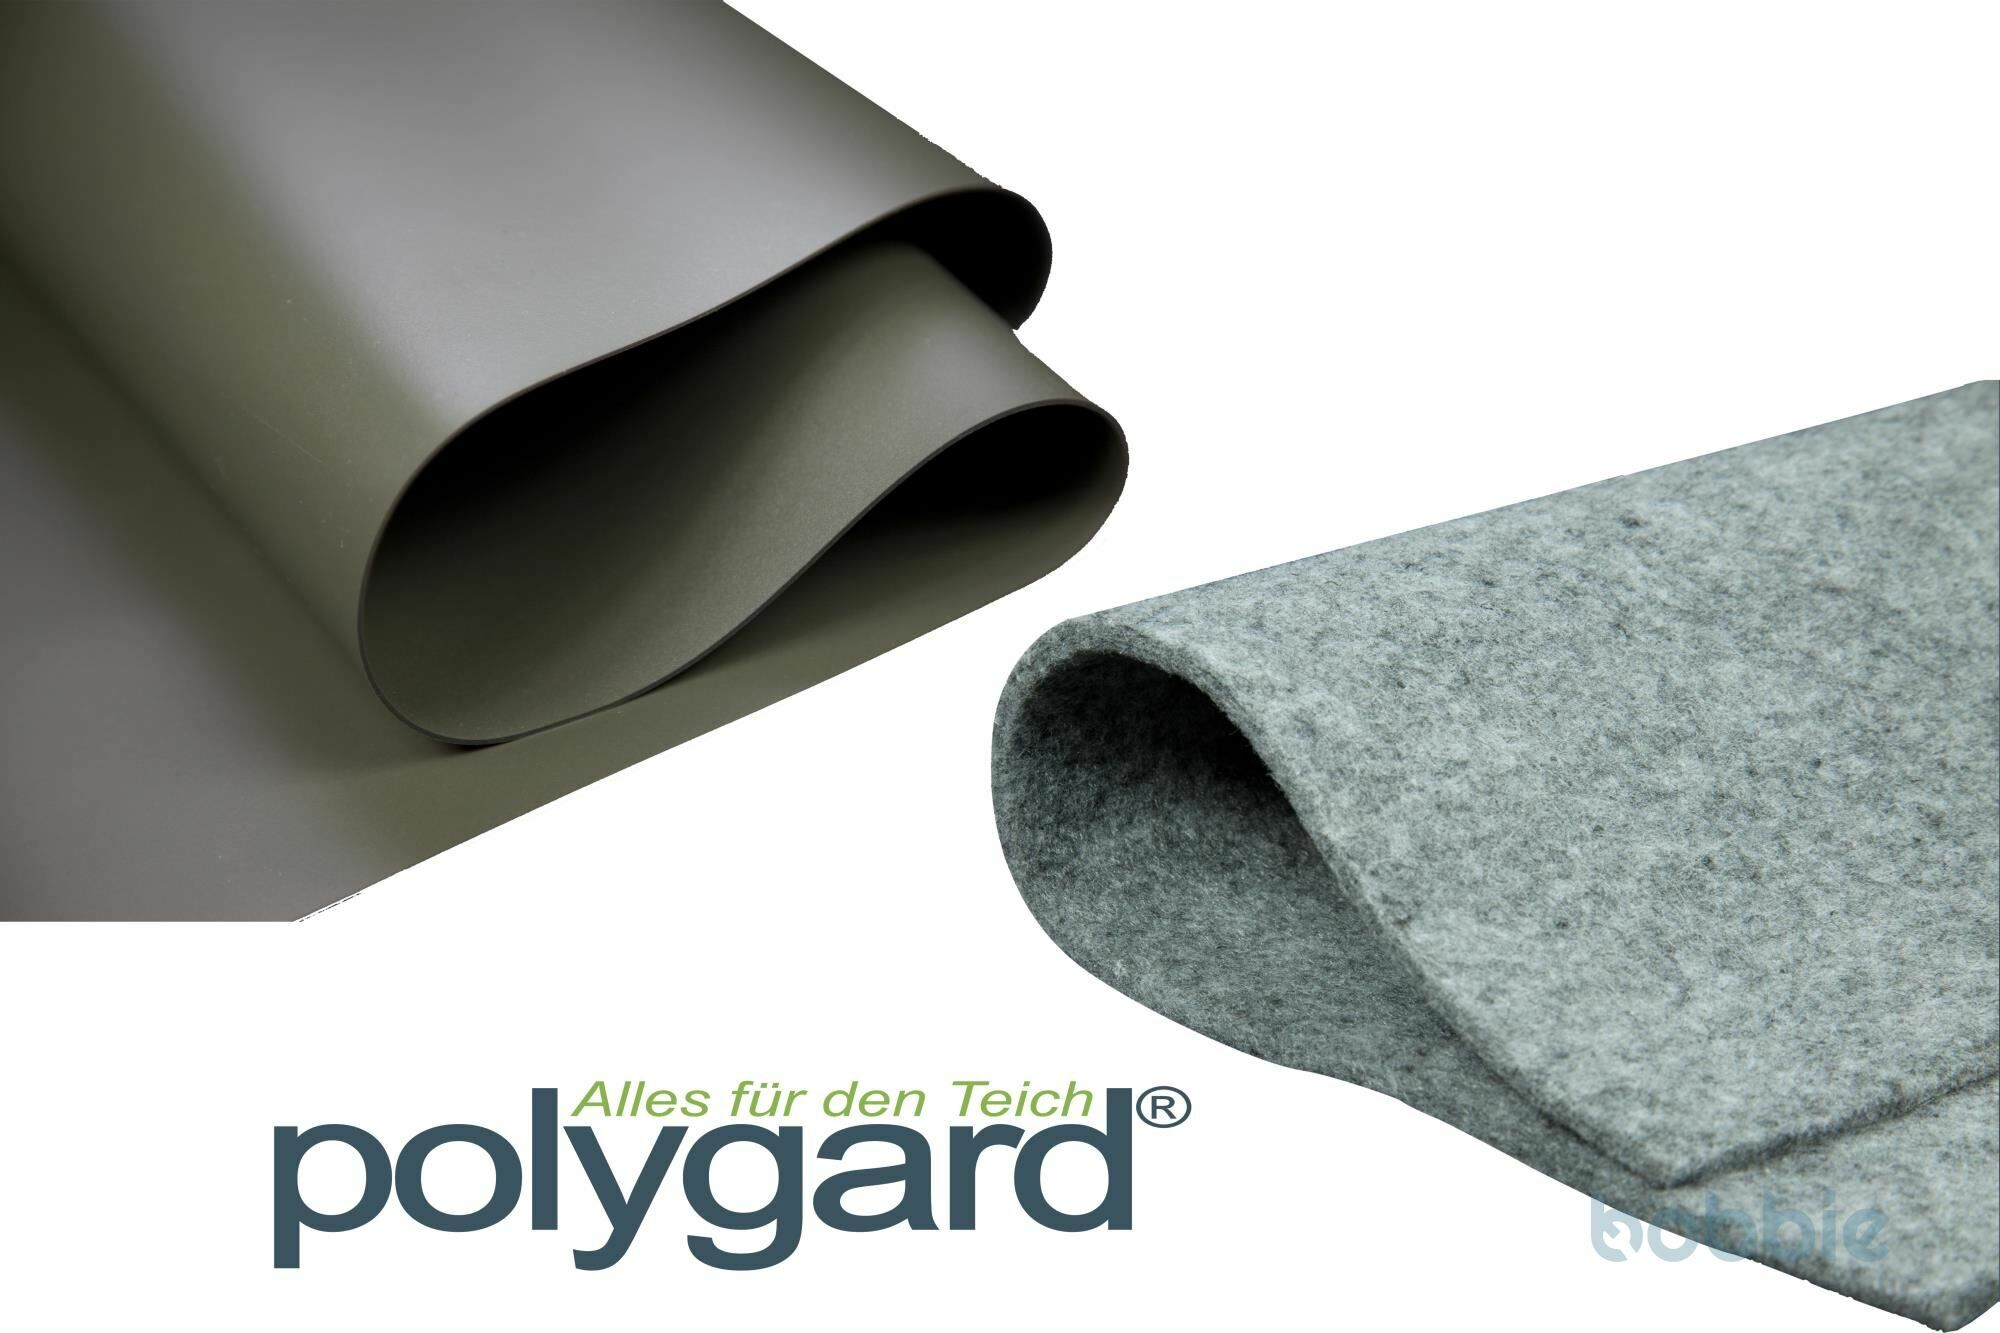 Polygard PVC Teichfolie 1,5mm oliv-grün inkl. Vlies 500g/m²